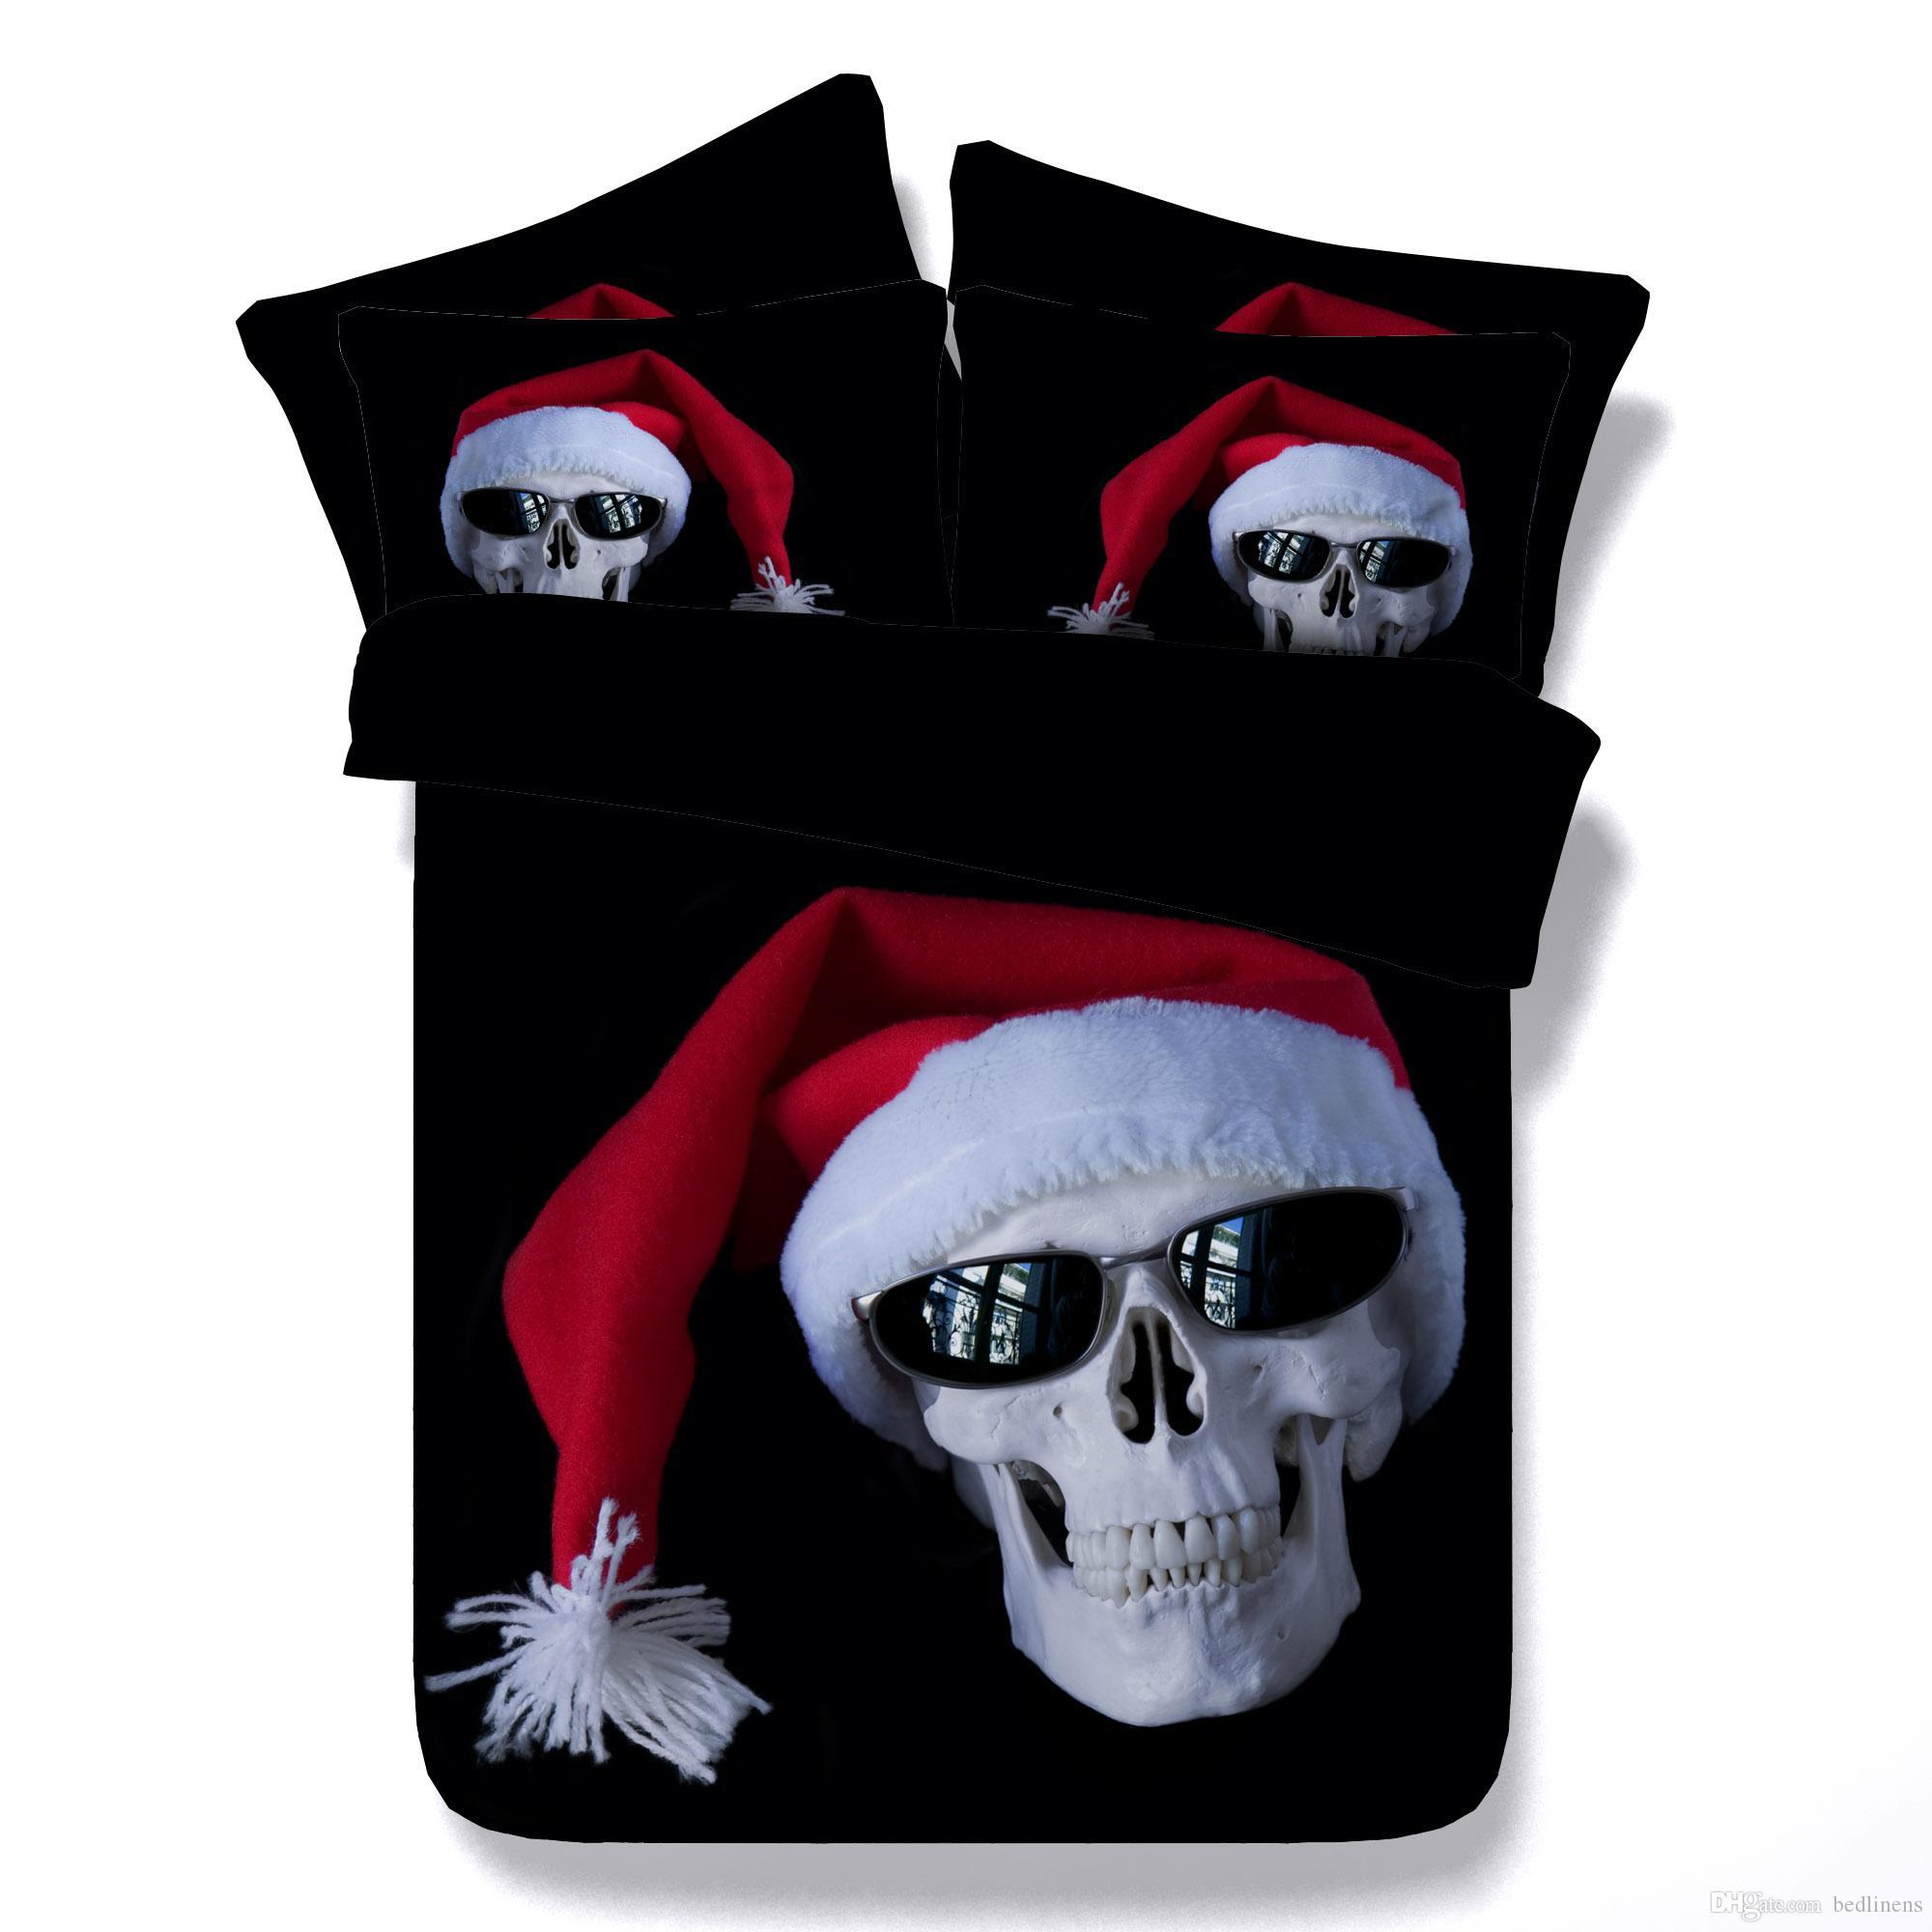 Hot Halloween Christmas Hat Black Skull Pumpkin 3D Skull Printed Bedding Sets Twin Full Queen King Size Duvet Covers Pillow Shams Comforter